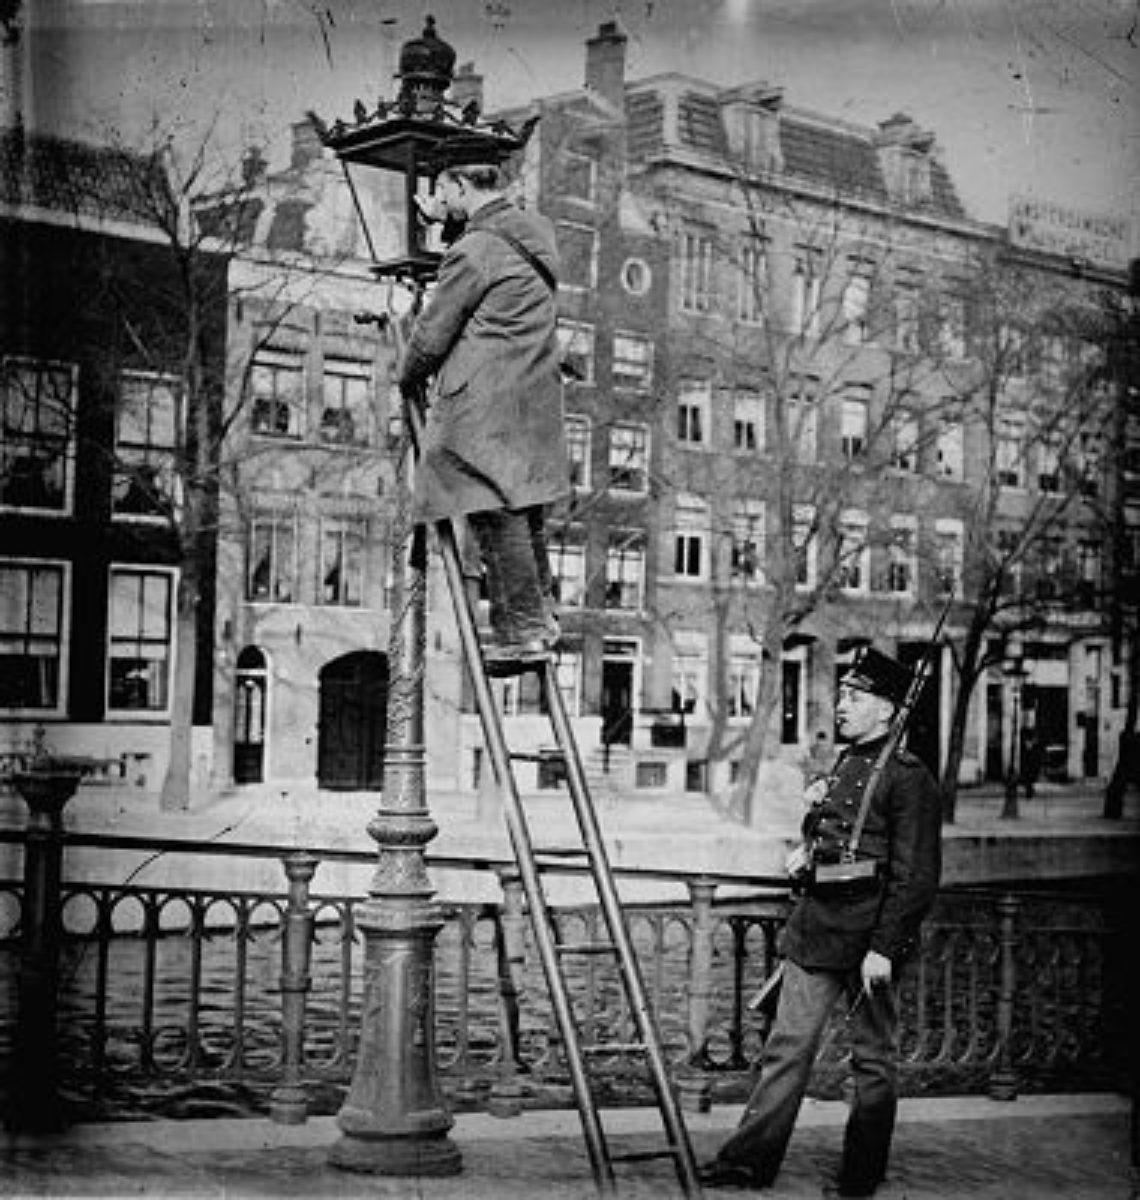 Amsterdamse Grachtenmast Oud